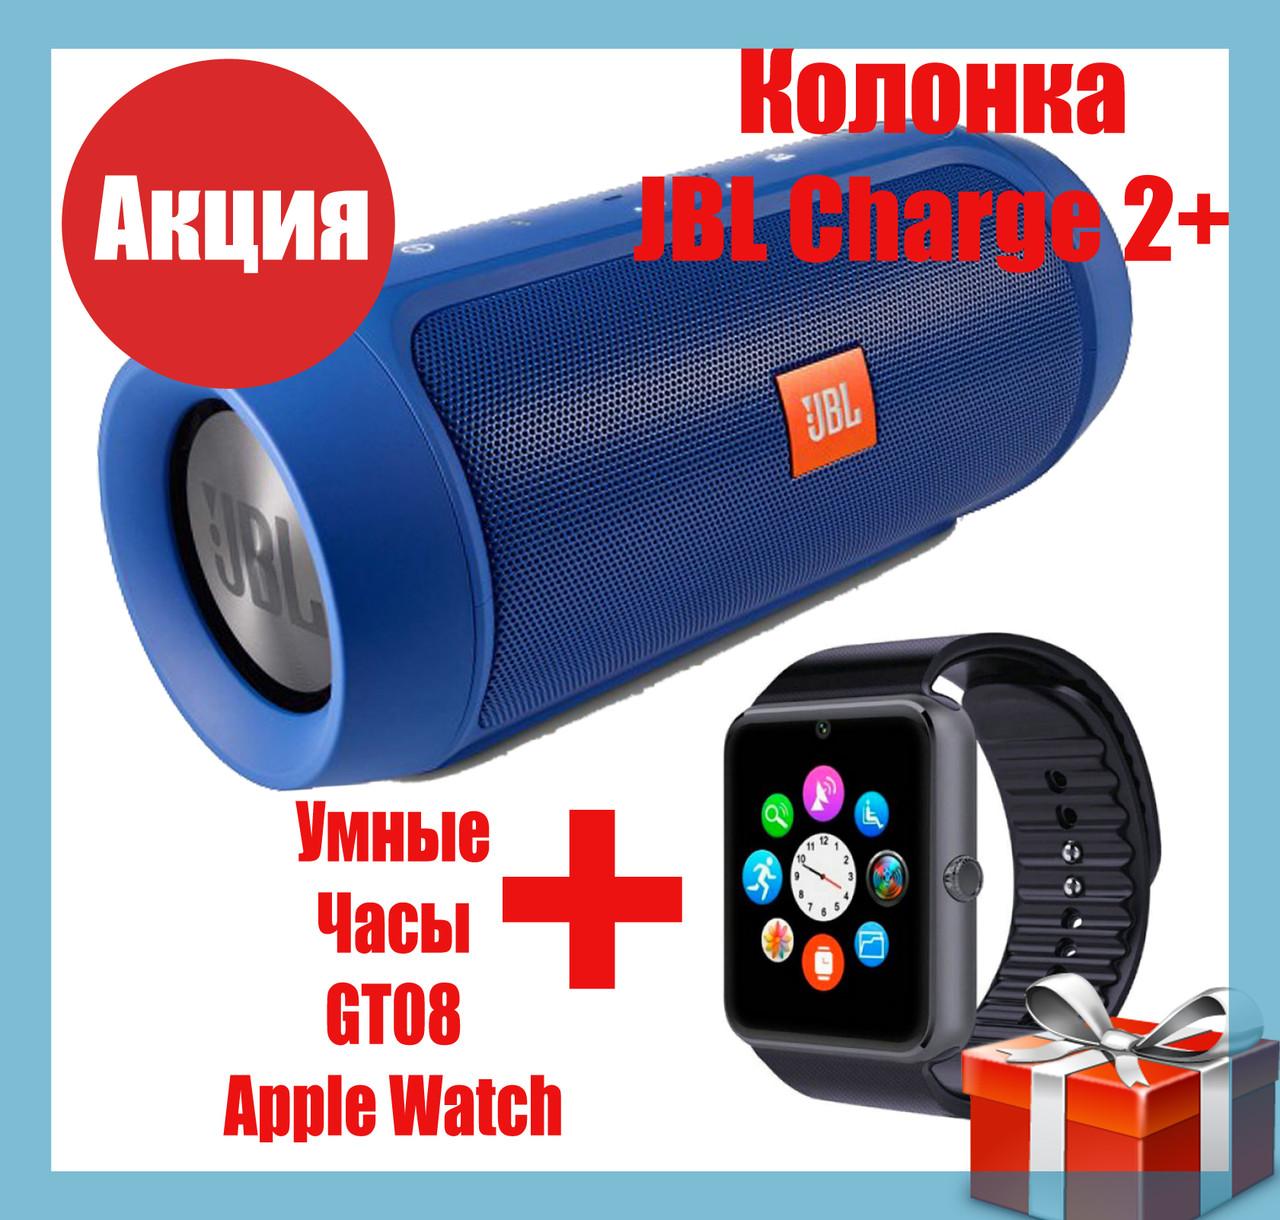 Колонка JBL Charge 2+ Bluetooth , FM радио MP3 AUX USB microSD, 15W + подарок умные часы GT08 QualityReplica